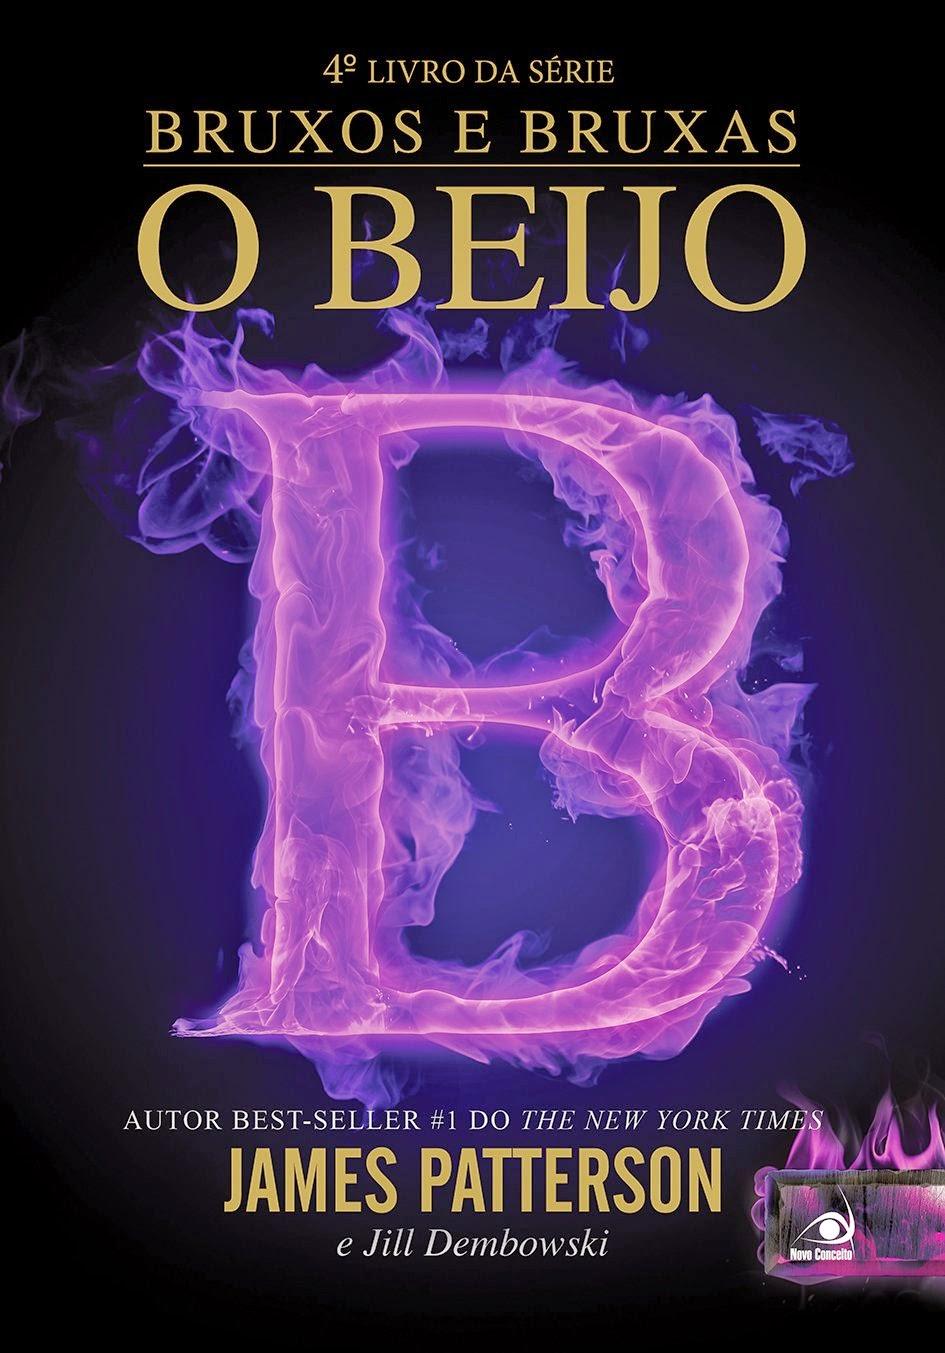 http://www.skoob.com.br/livro/393602ED445525-o-beijo